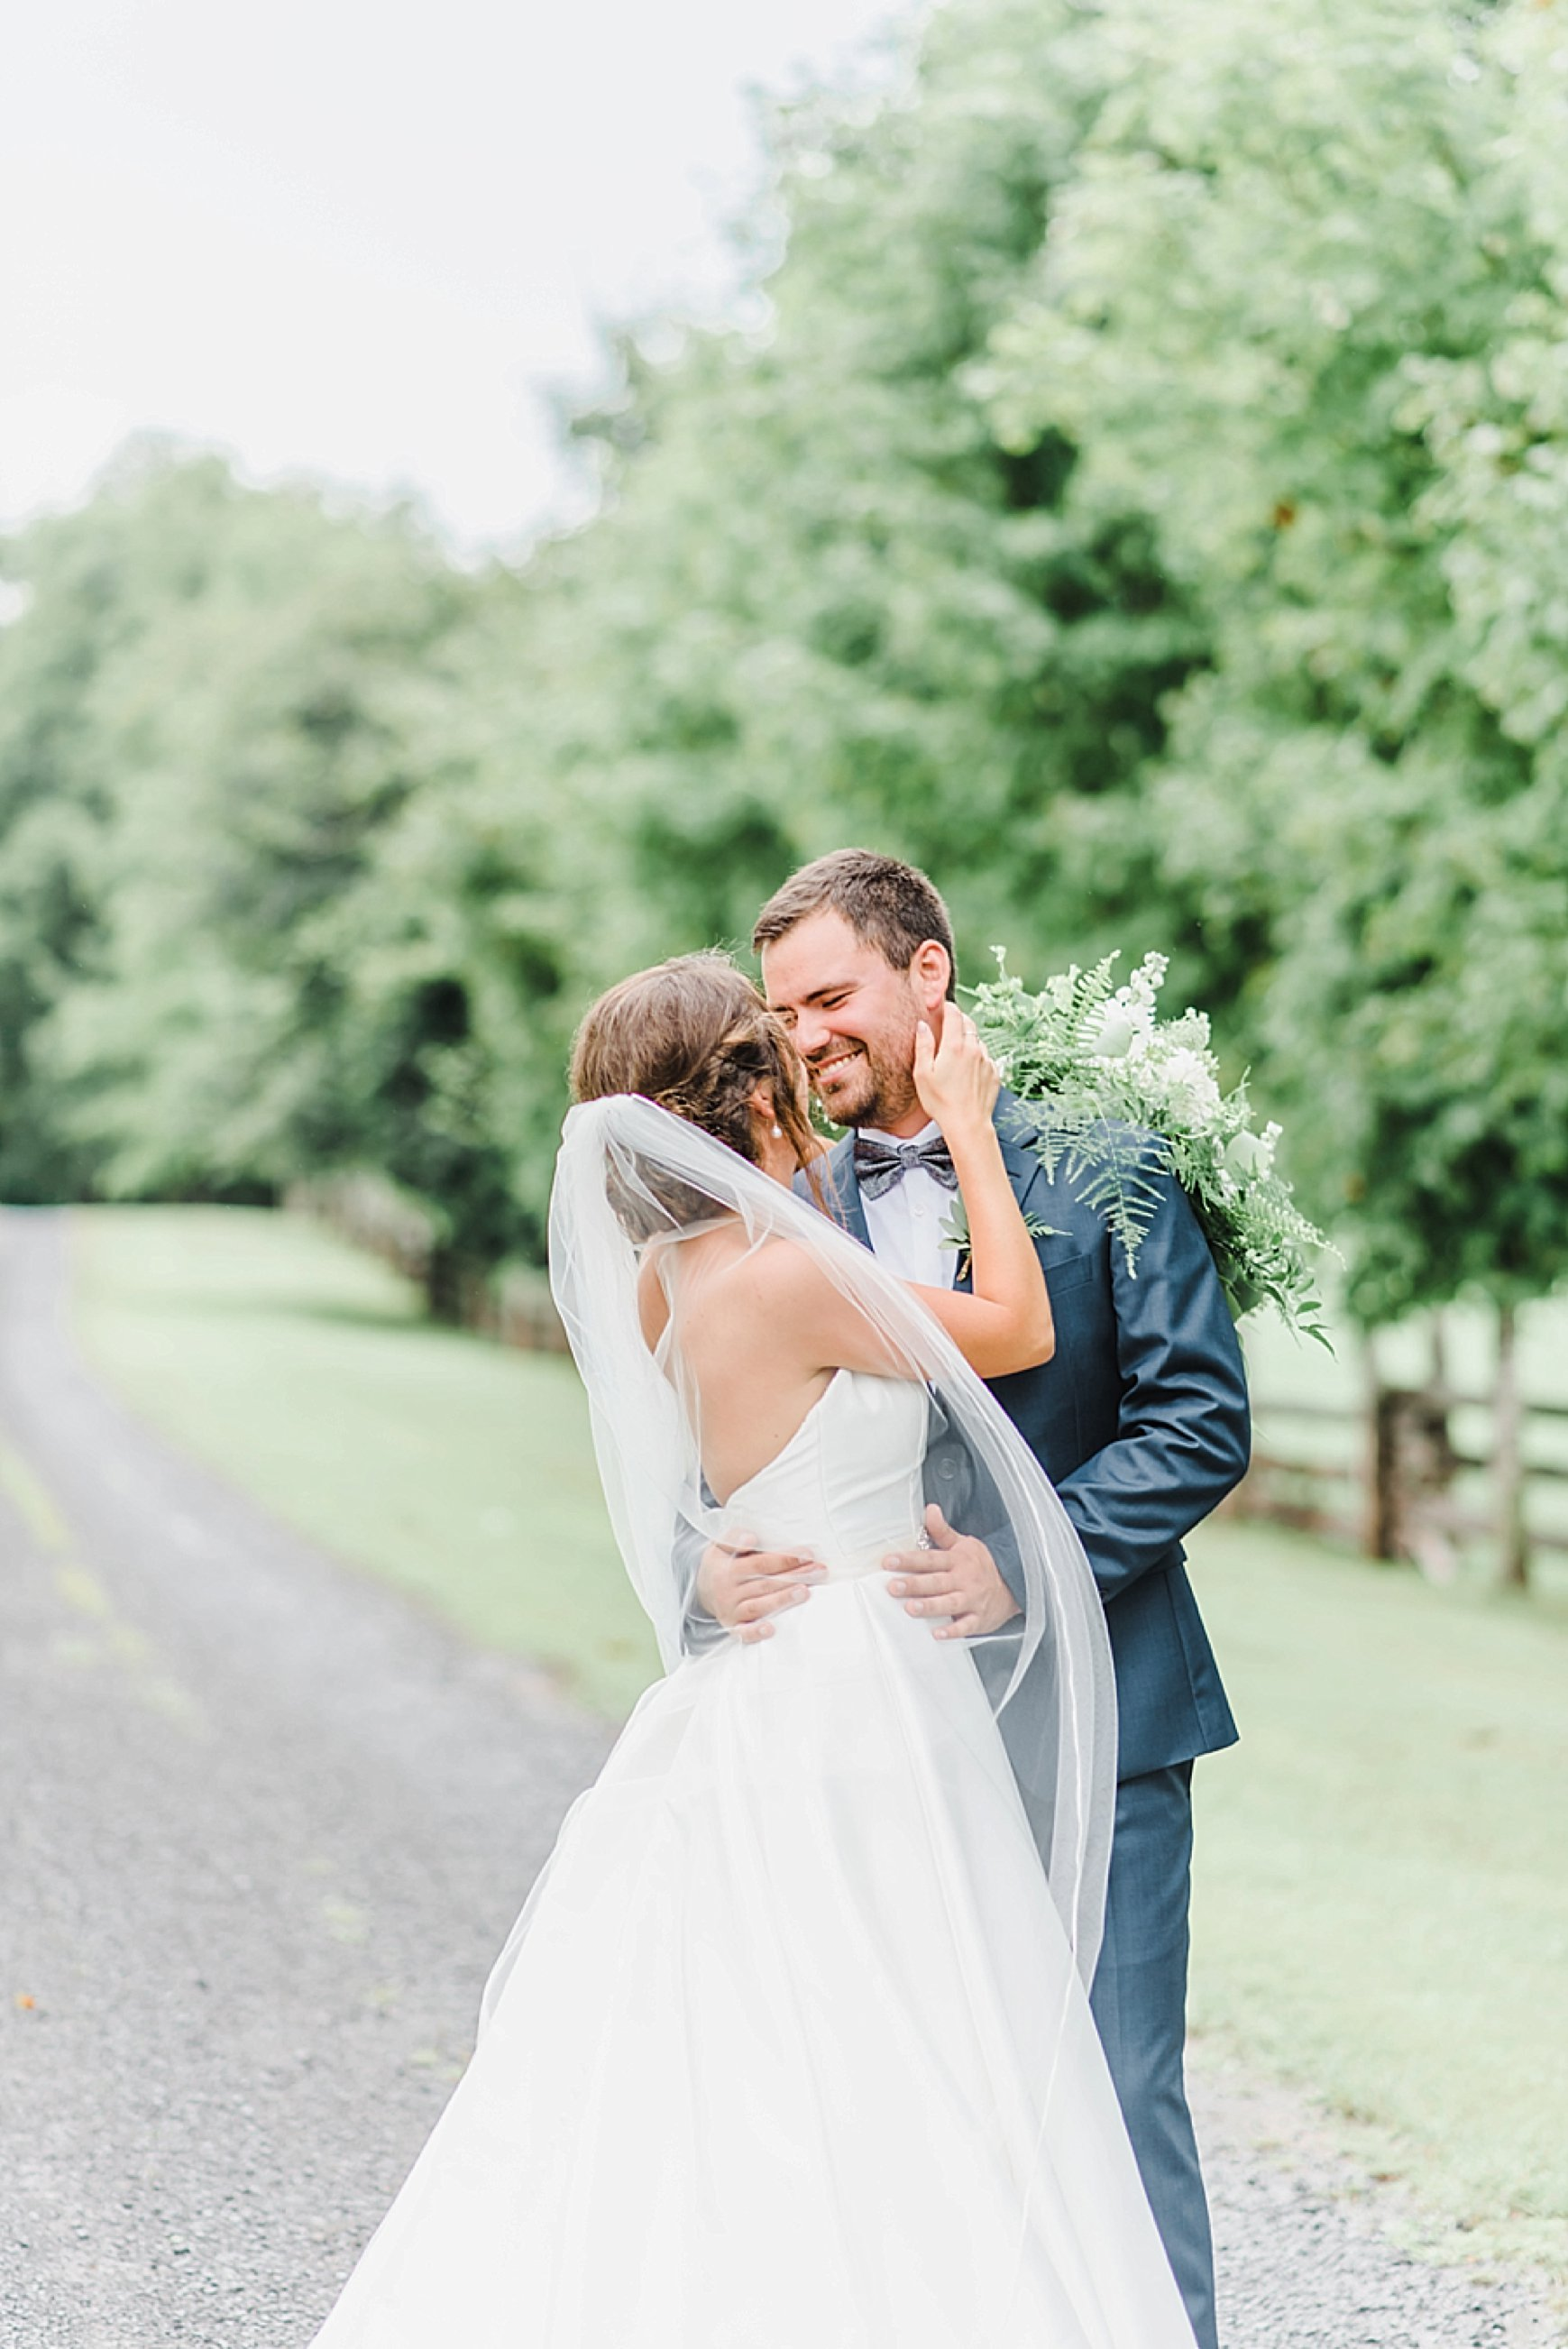 light airy indie fine art ottawa wedding photographer | Ali and Batoul Photography_0495.jpg